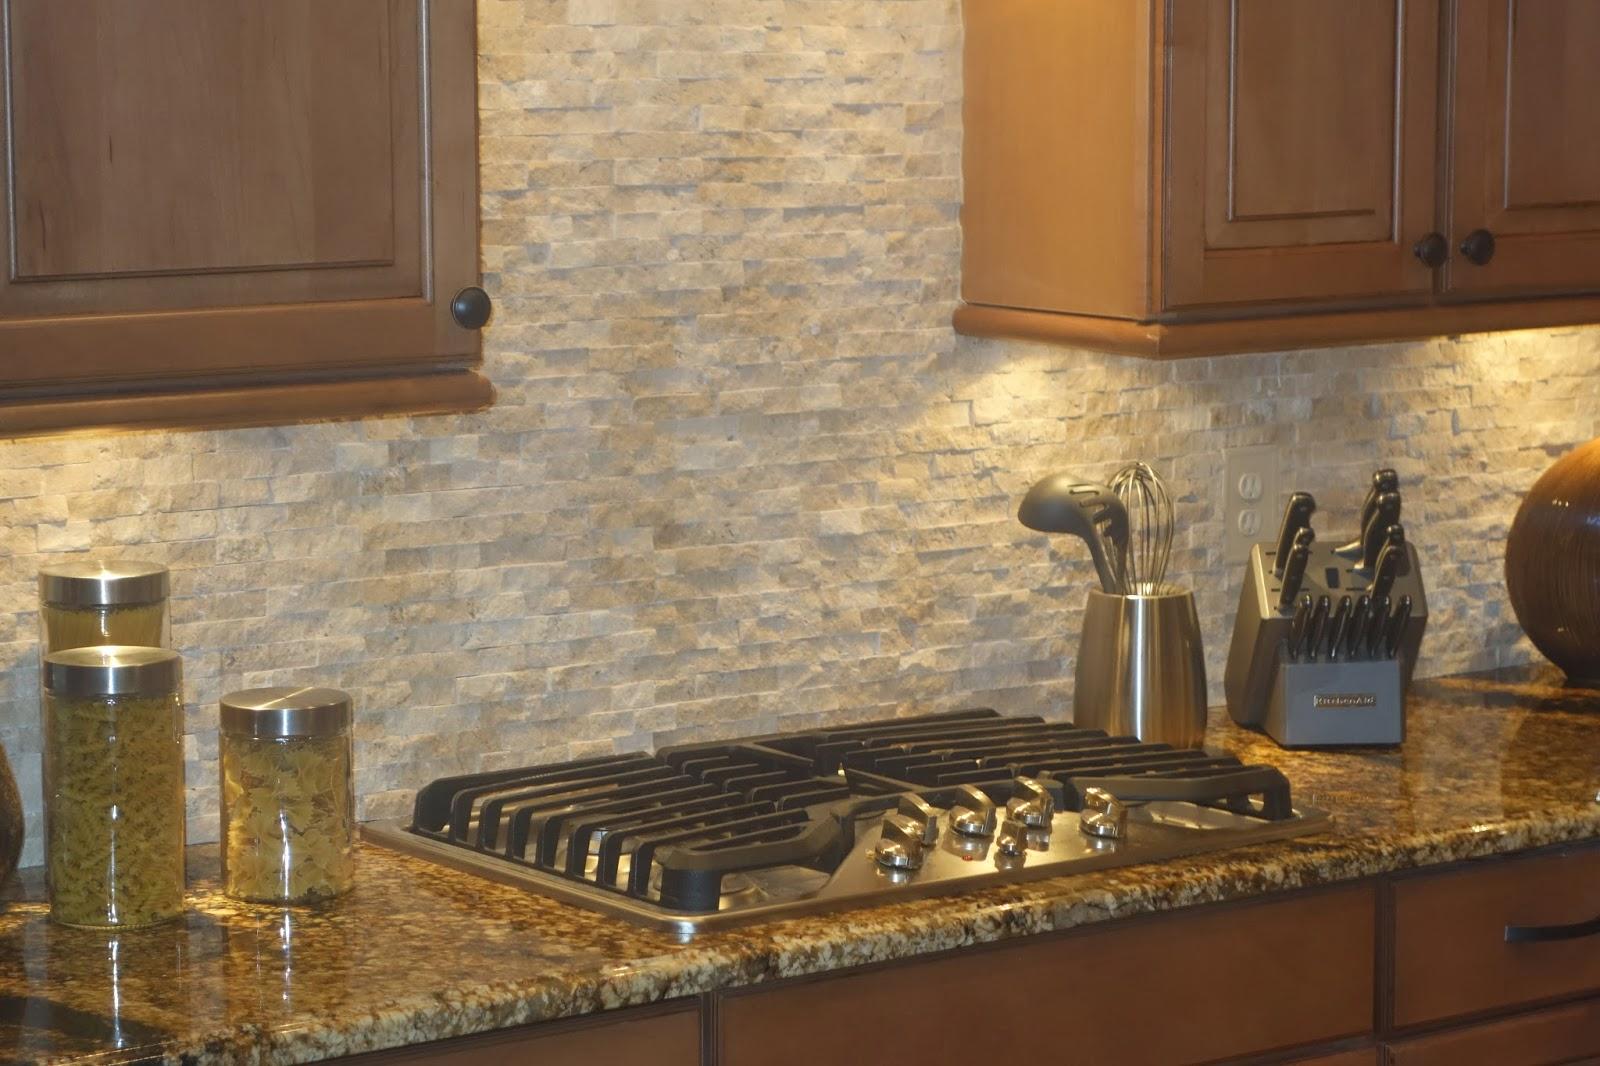 Natural Stone Kitchen Backsplash - Bestsciaticatreatments.com